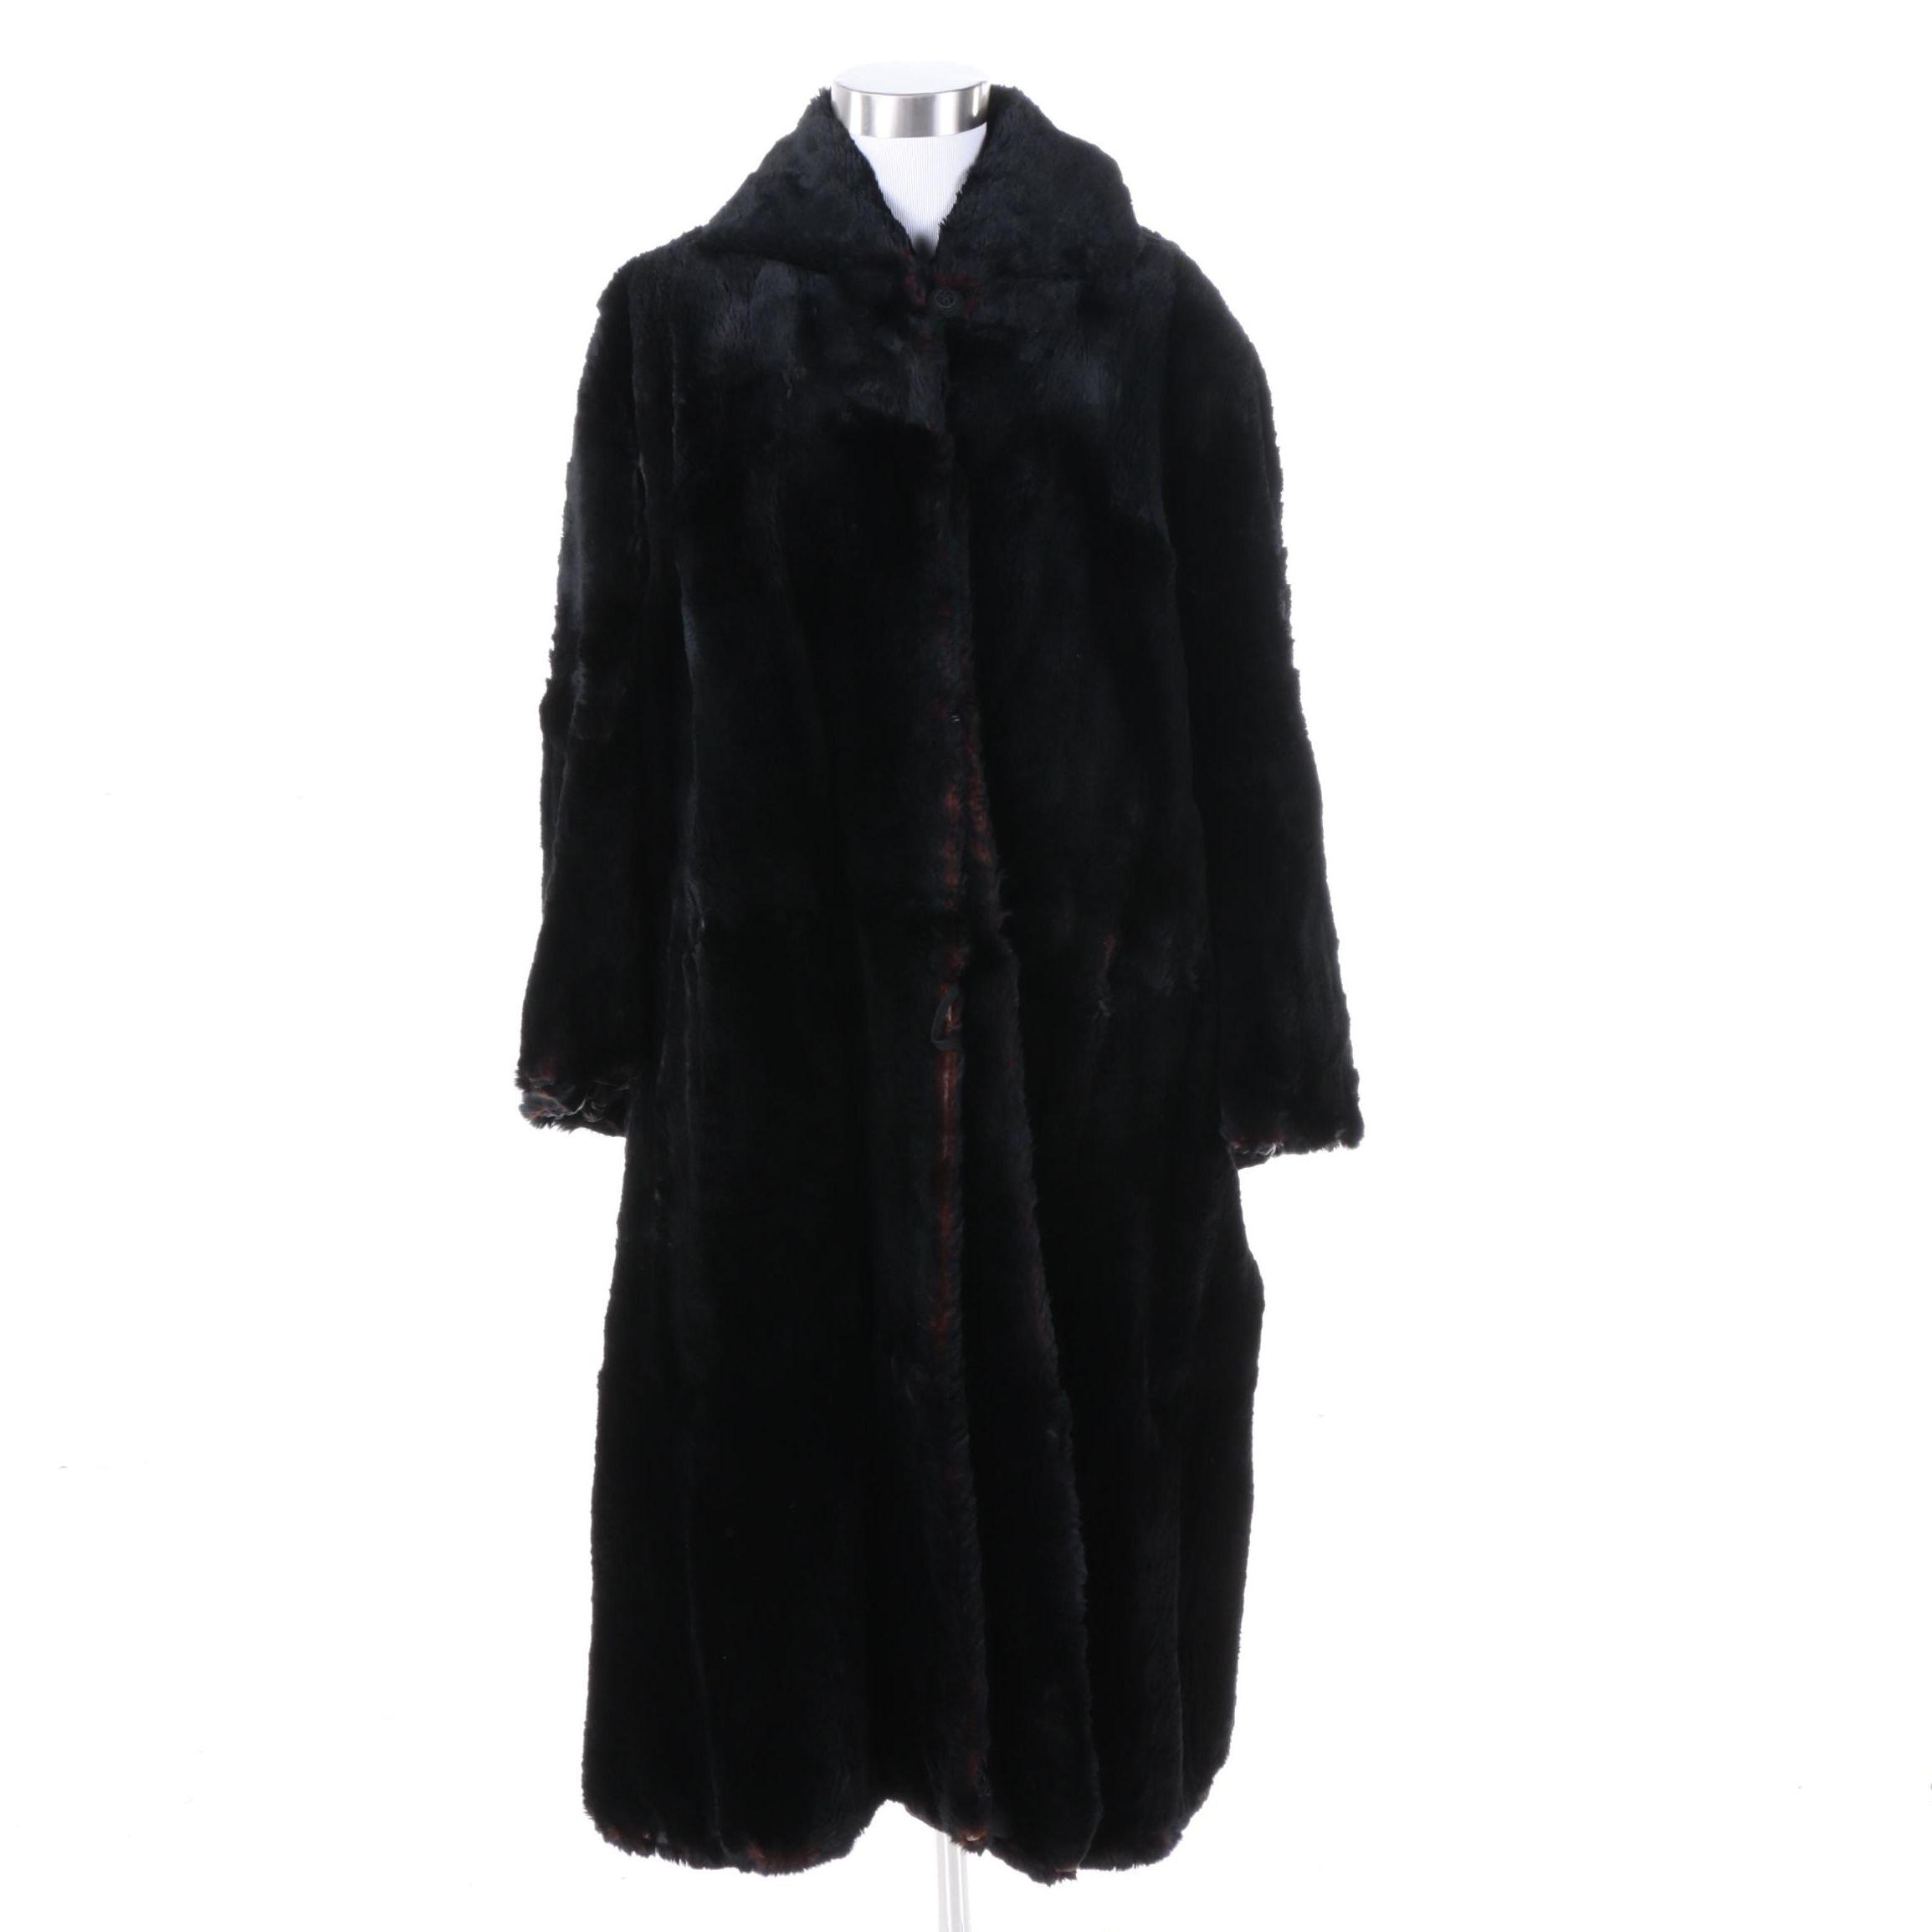 Dyed Black Sheared Beaver Fur Coat